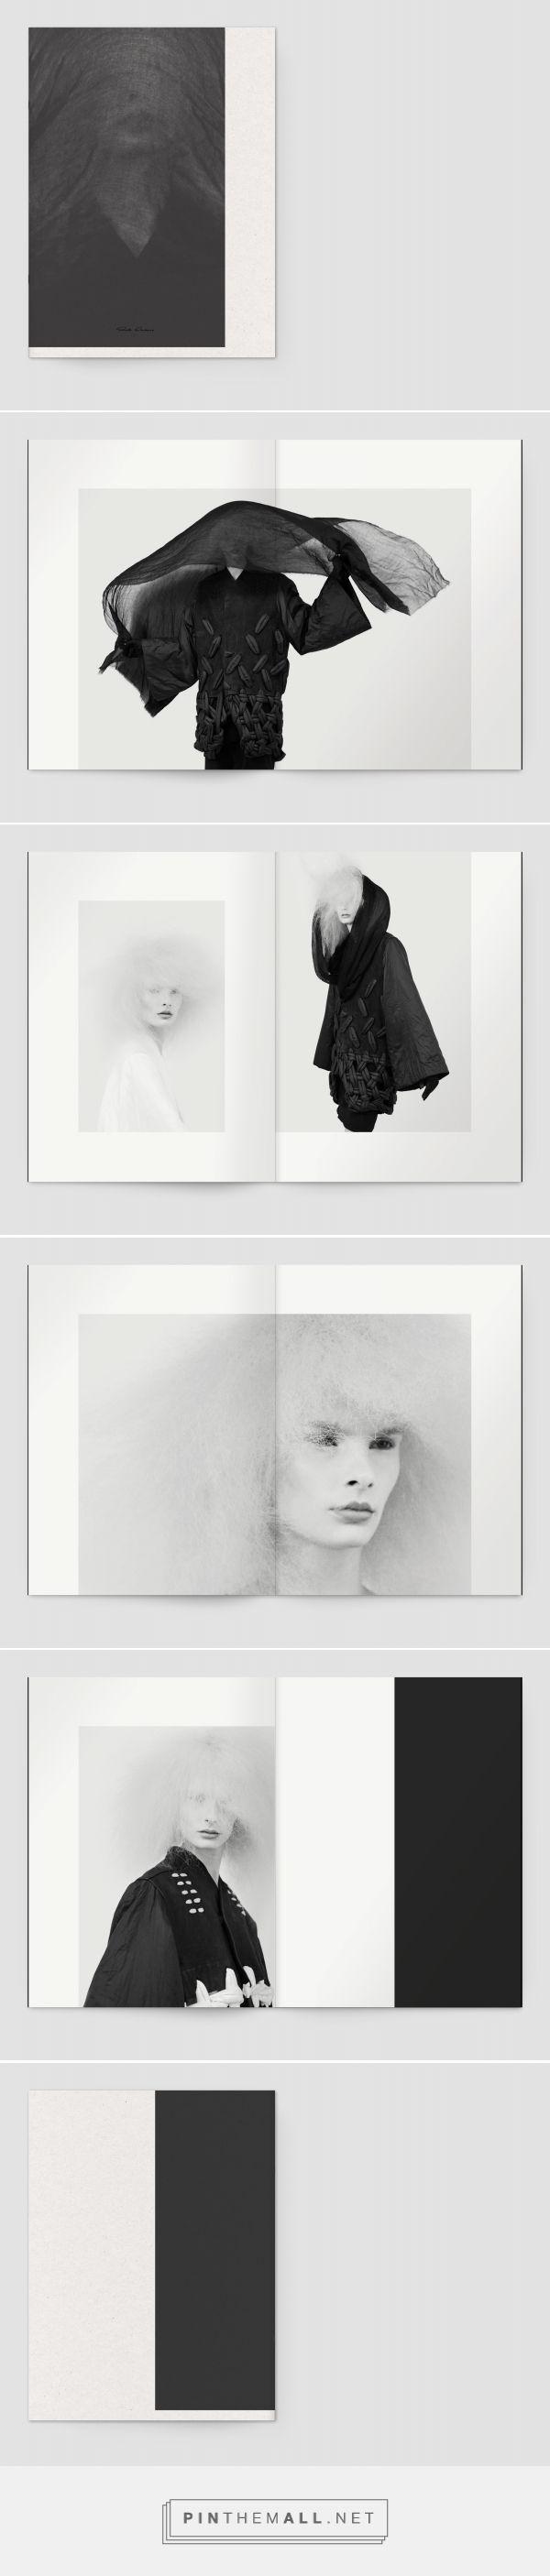 Notter + Vigne - F/W13 Plinth women                                                                                                                                                     Mehr